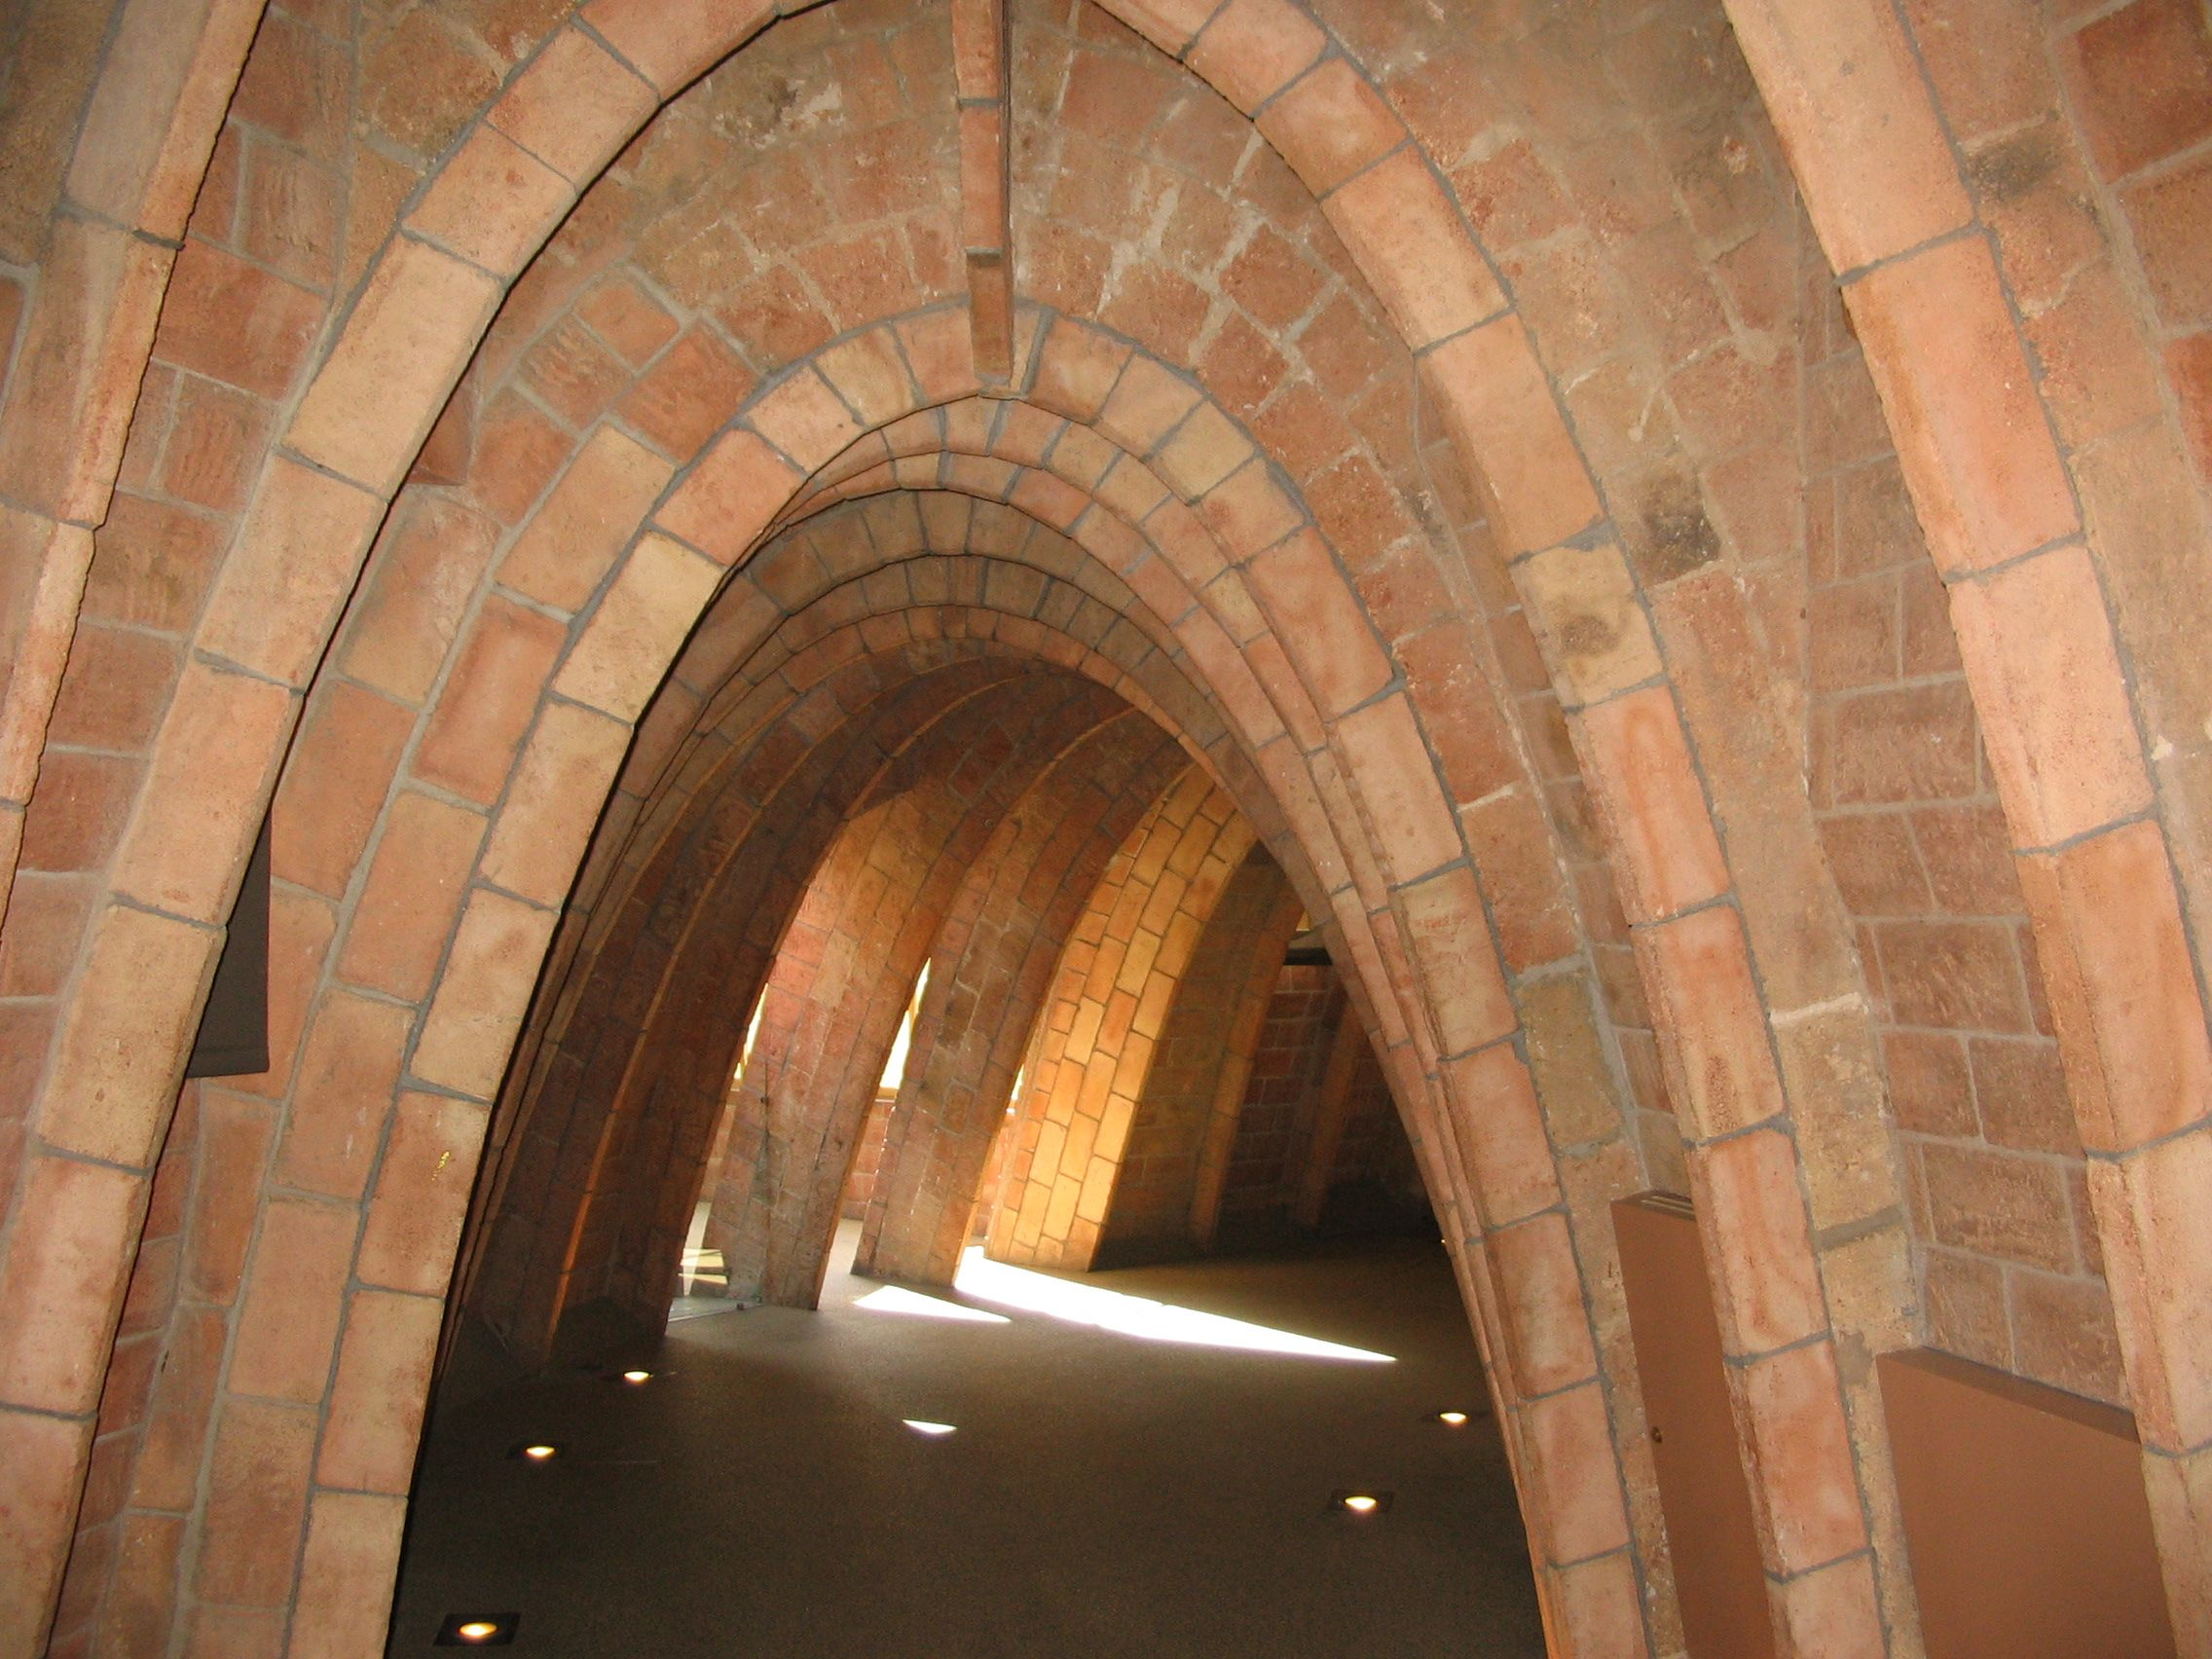 Gaudi S Parabolic Arches Constructed Of Brick And Mortar